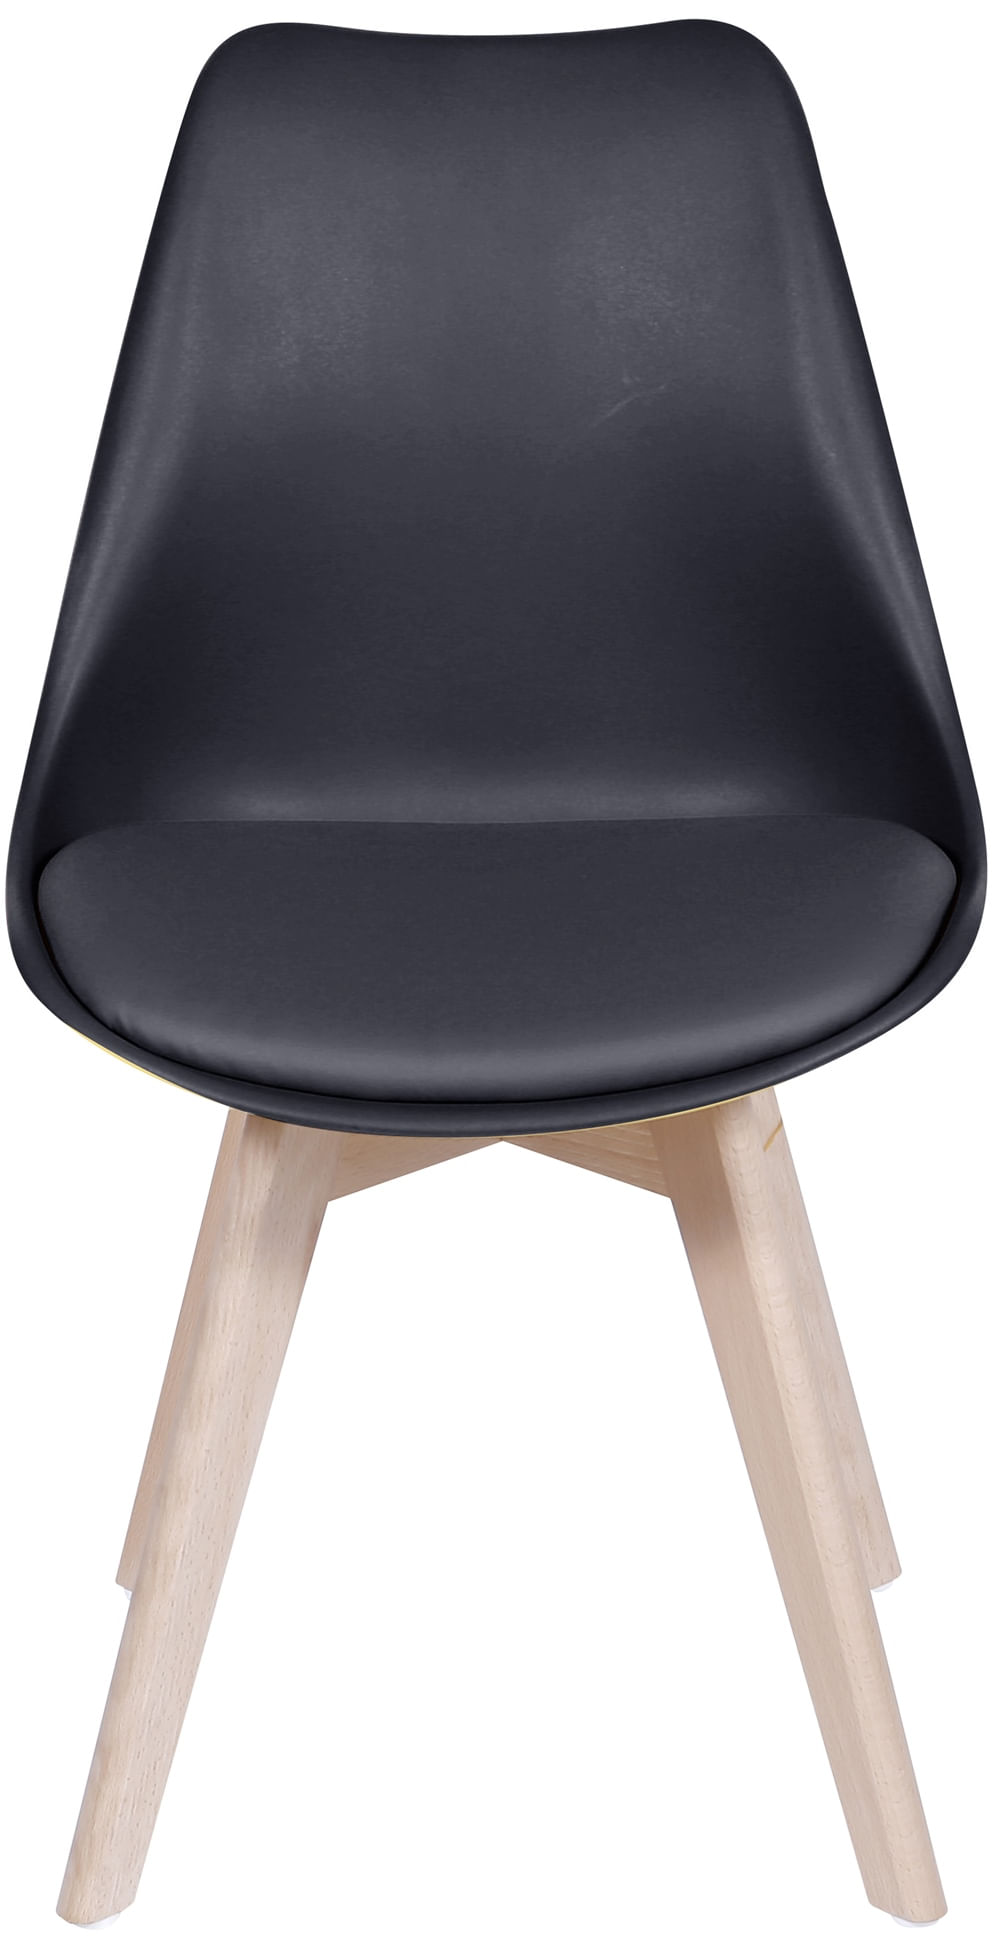 Cadeira Saarinen Preta Base Madeira - 32069